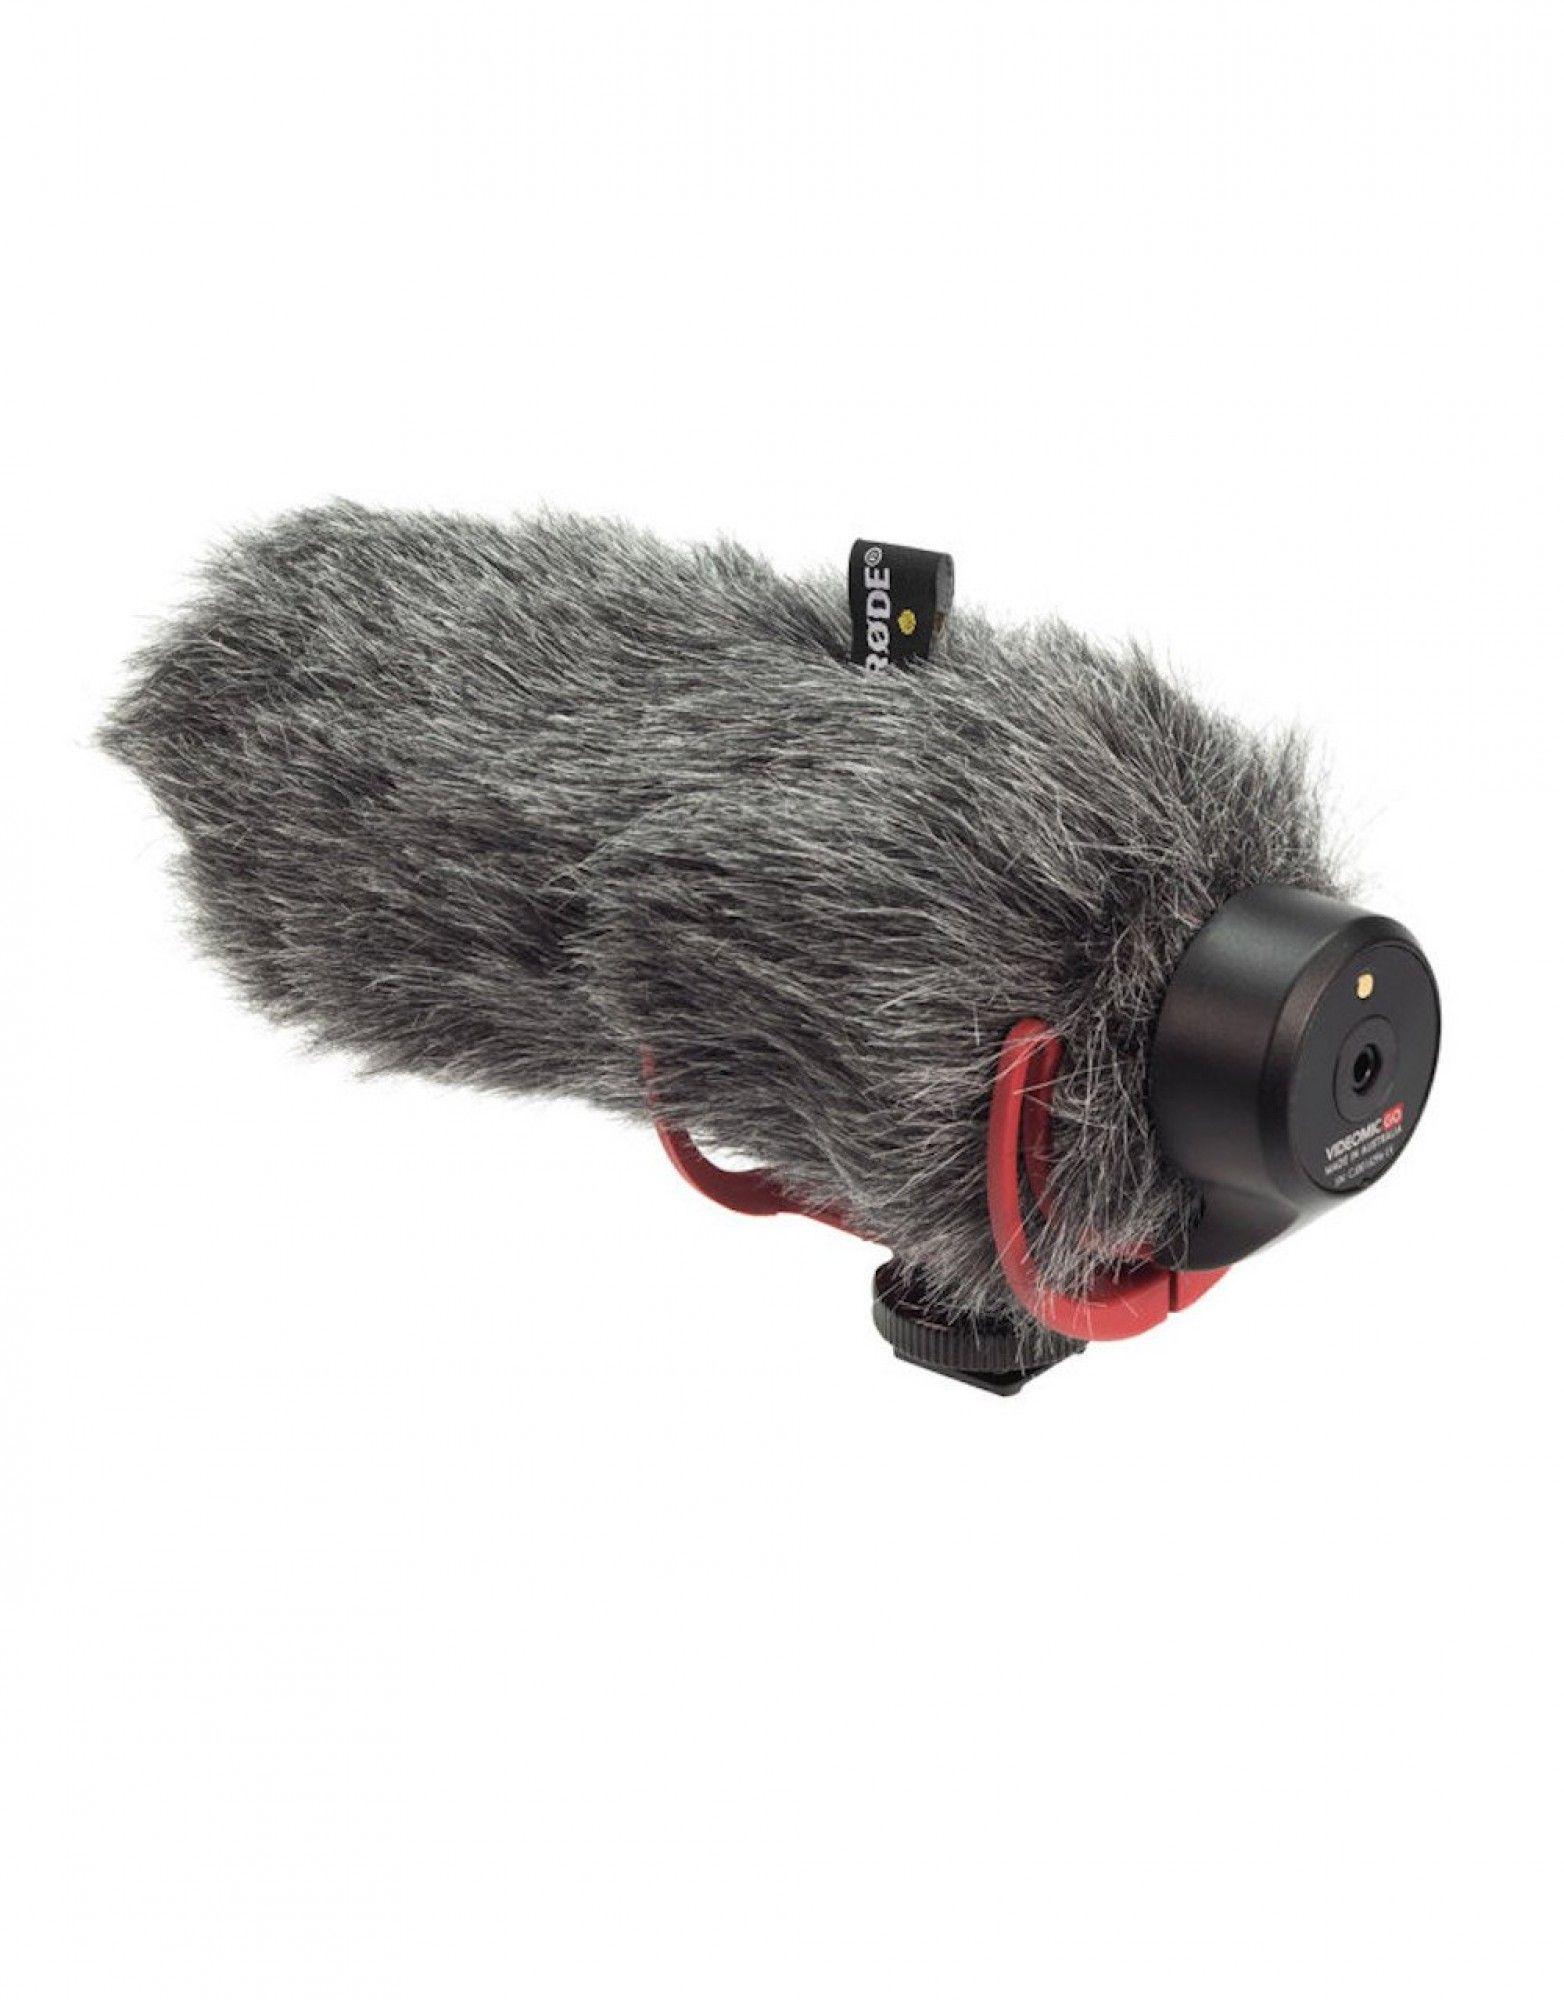 Rode VideoMic GO Lightweight On-Camera Microphone - VMGO